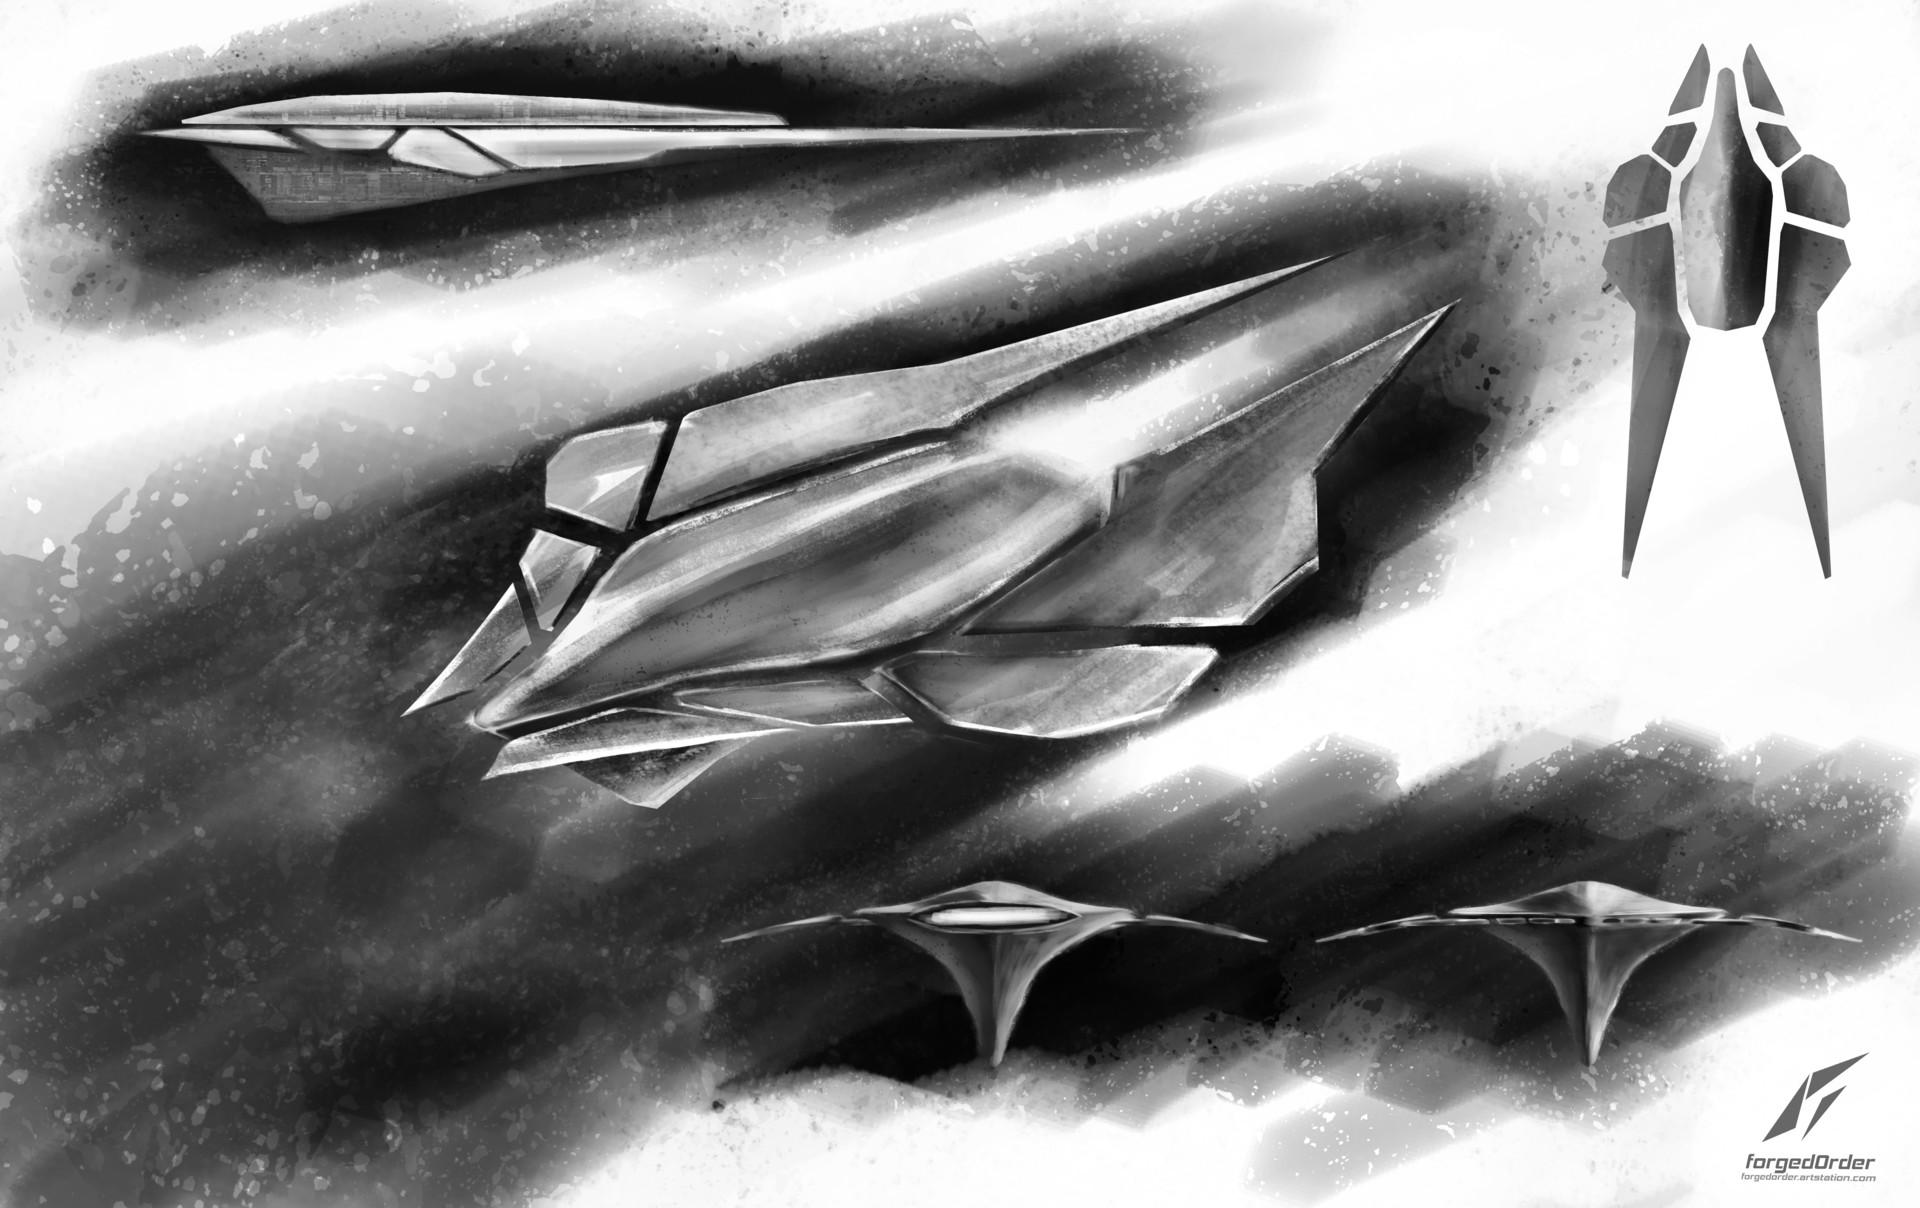 Attila gallik forgedorder intergalactic scout